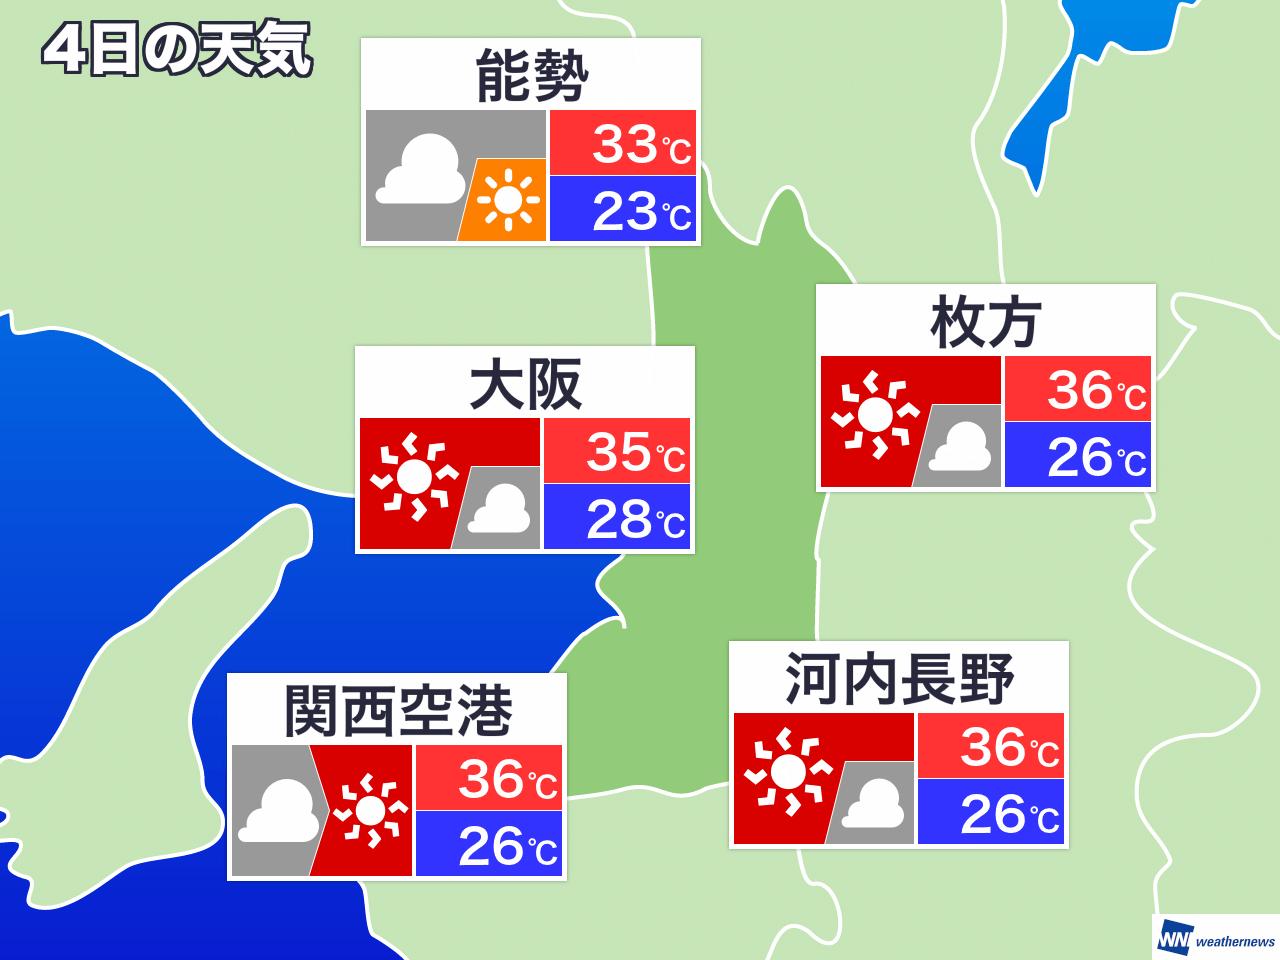 気温 明日 の